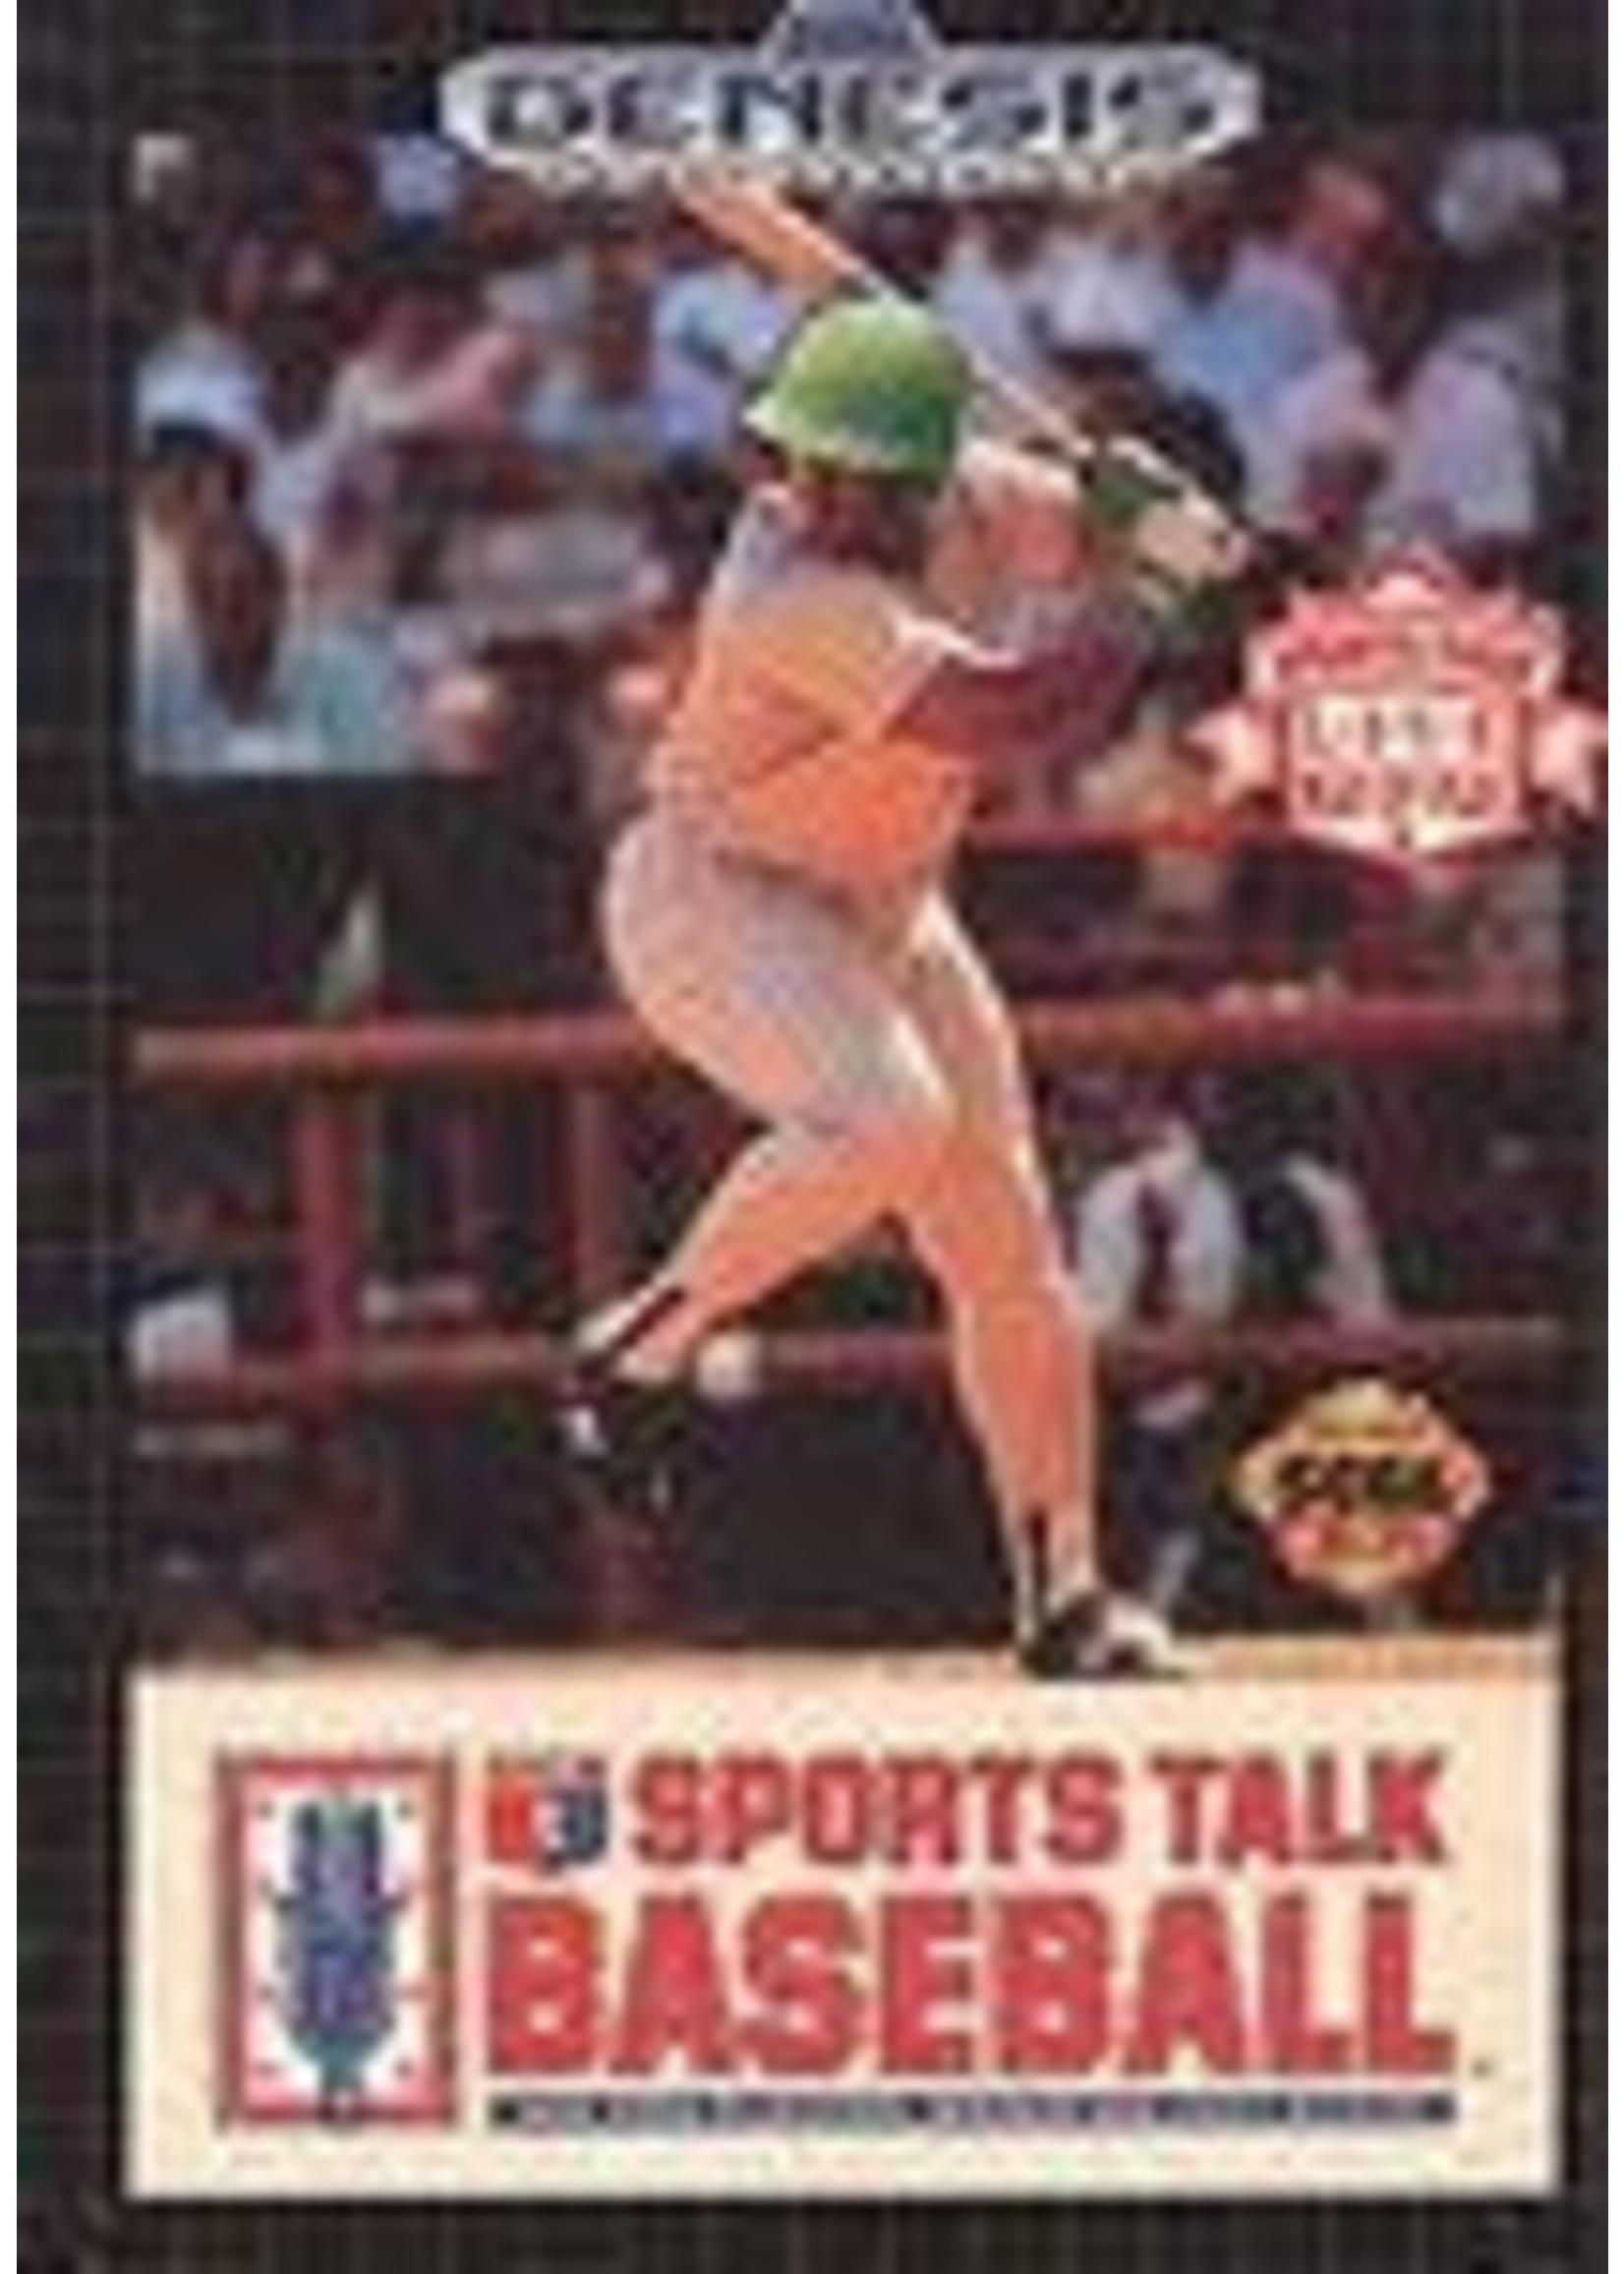 Sports Talk Baseball Sega Genesis